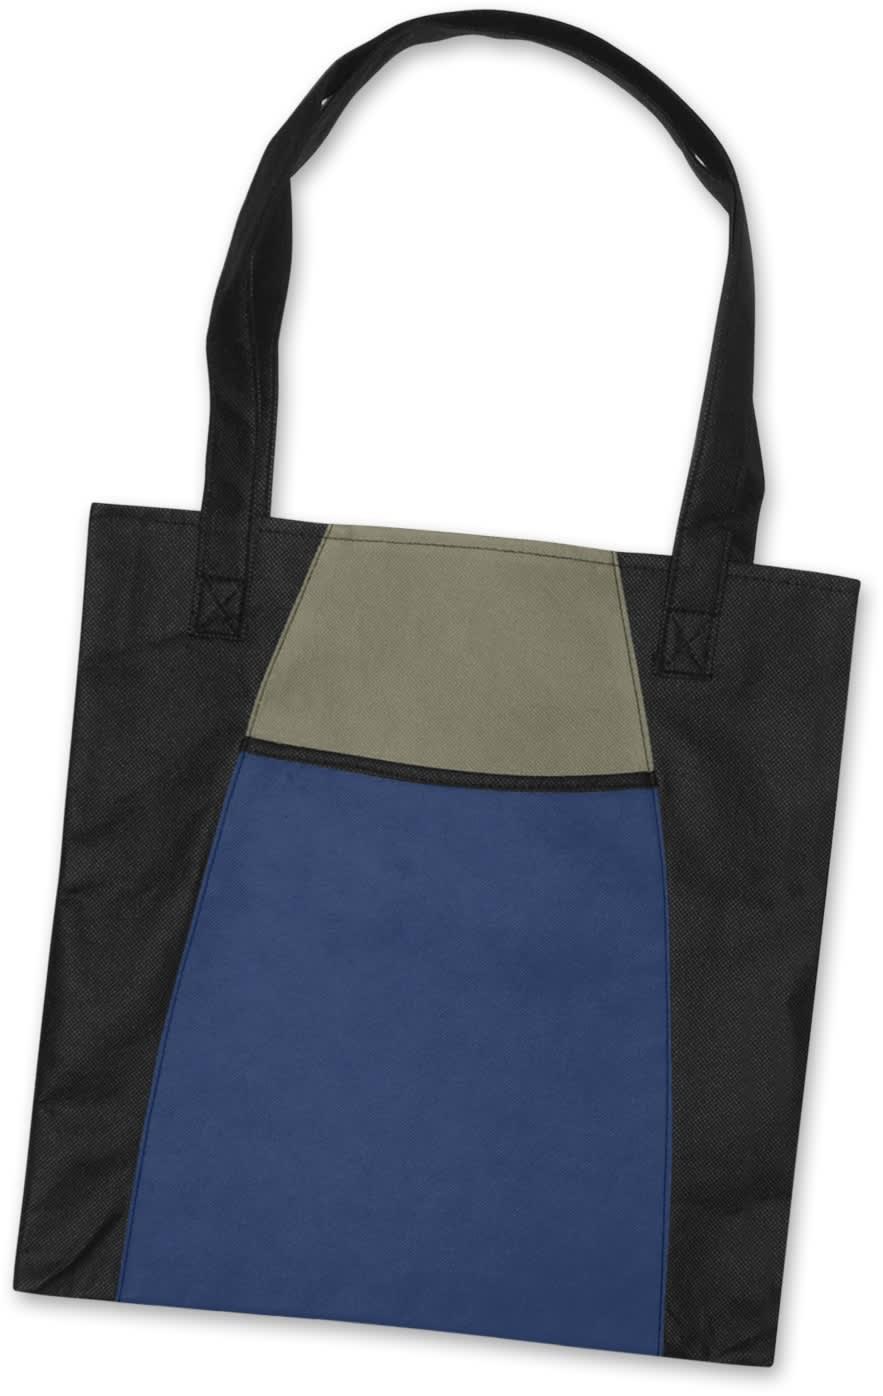 Blue/Black Promo Fashionable Tote Bag